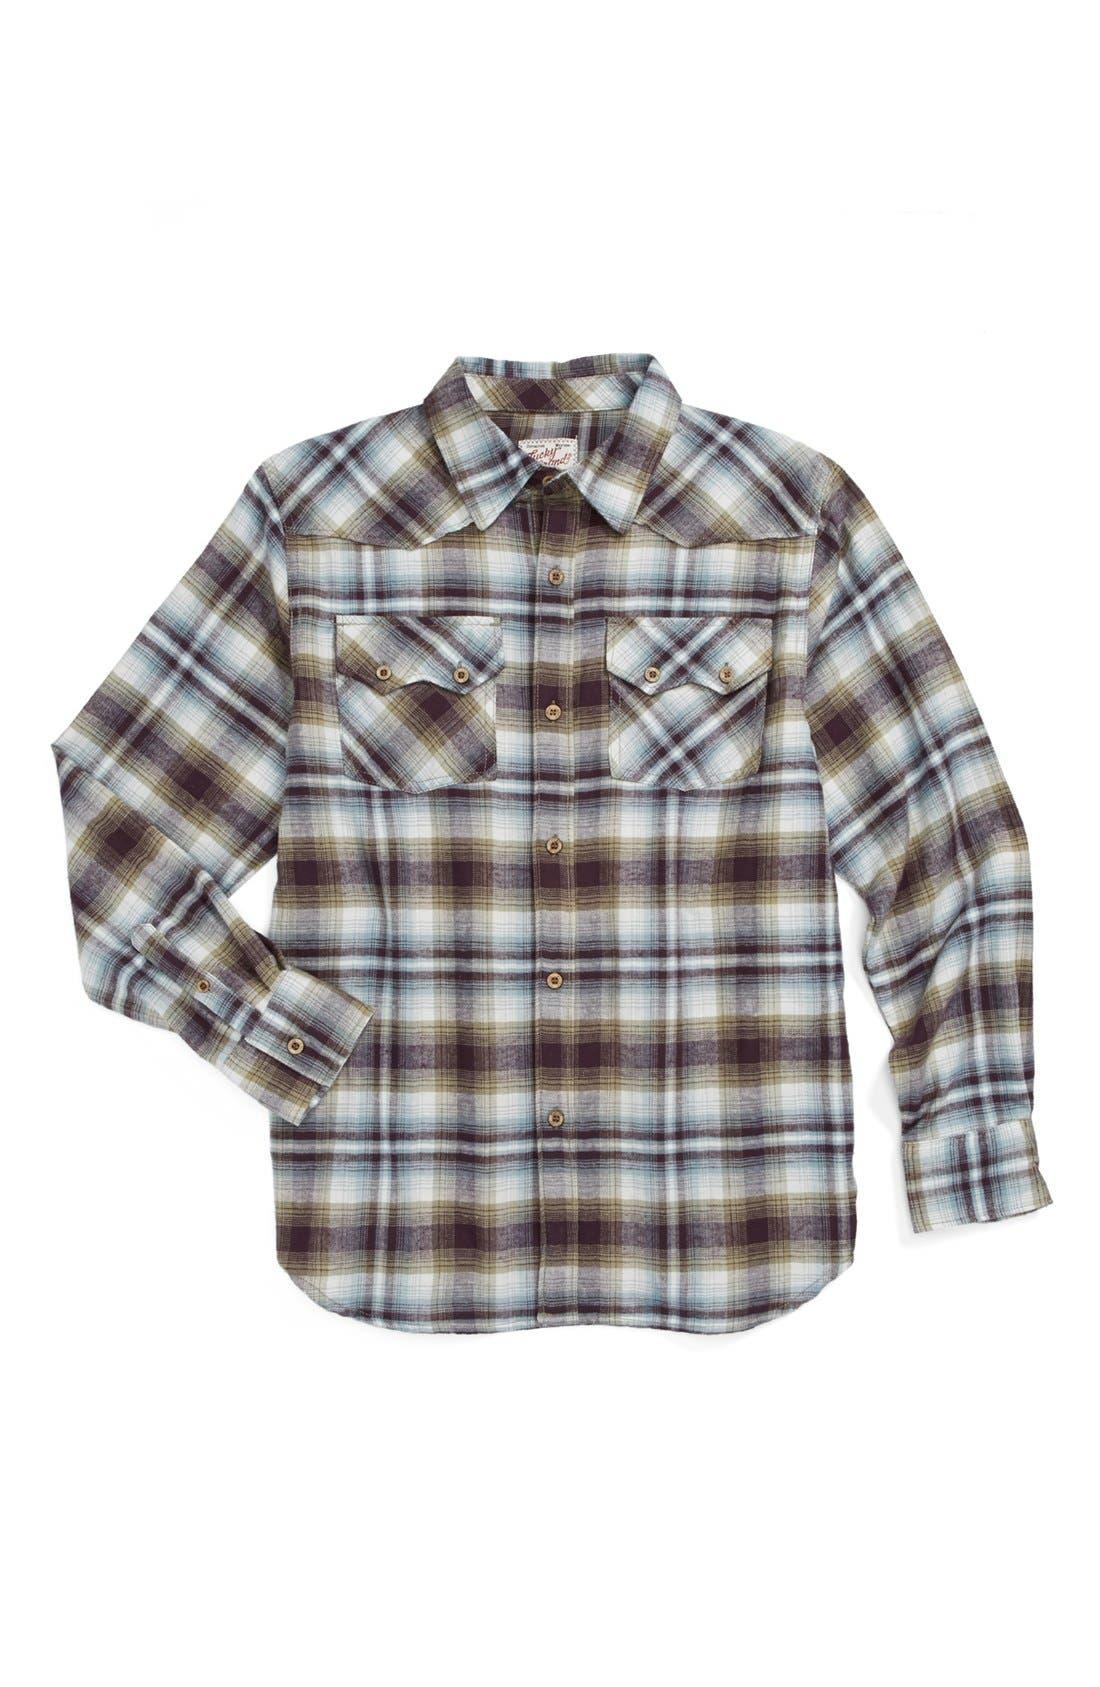 Alternate Image 1 Selected - Lucky Brand 'Speedster' Plaid Shirt (Big Boys)